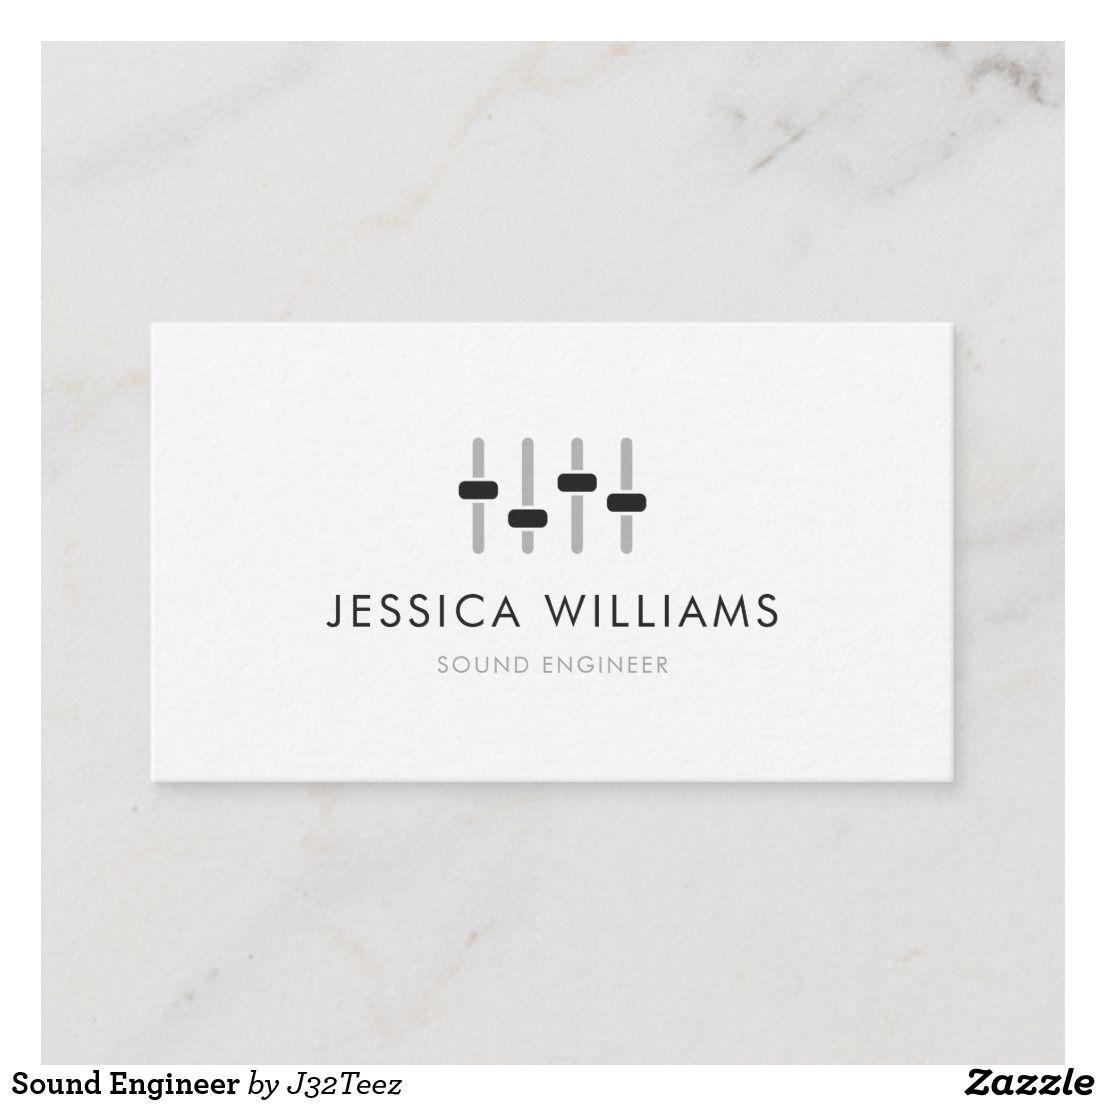 sound engineer business card  zazzle  sound engineer